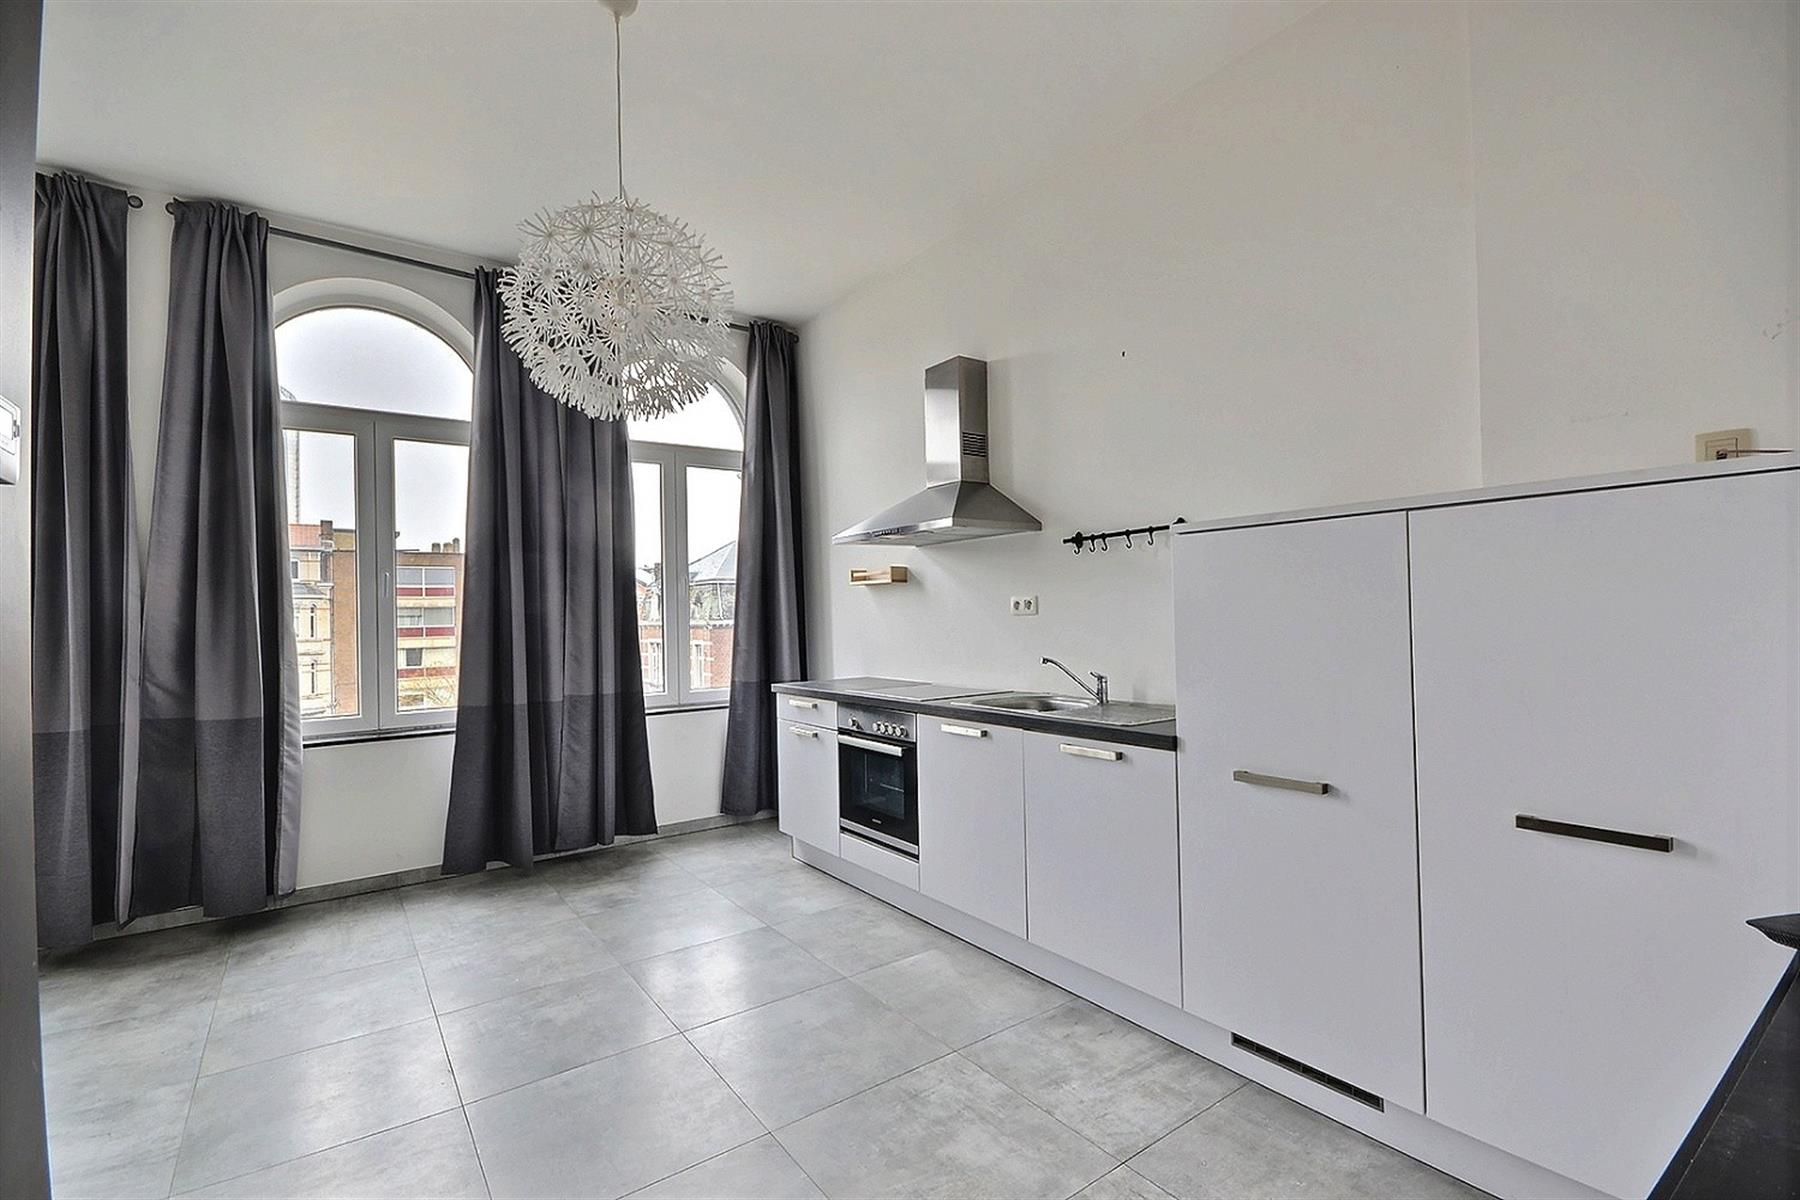 Appartement - LIÈGE - #4530417-1